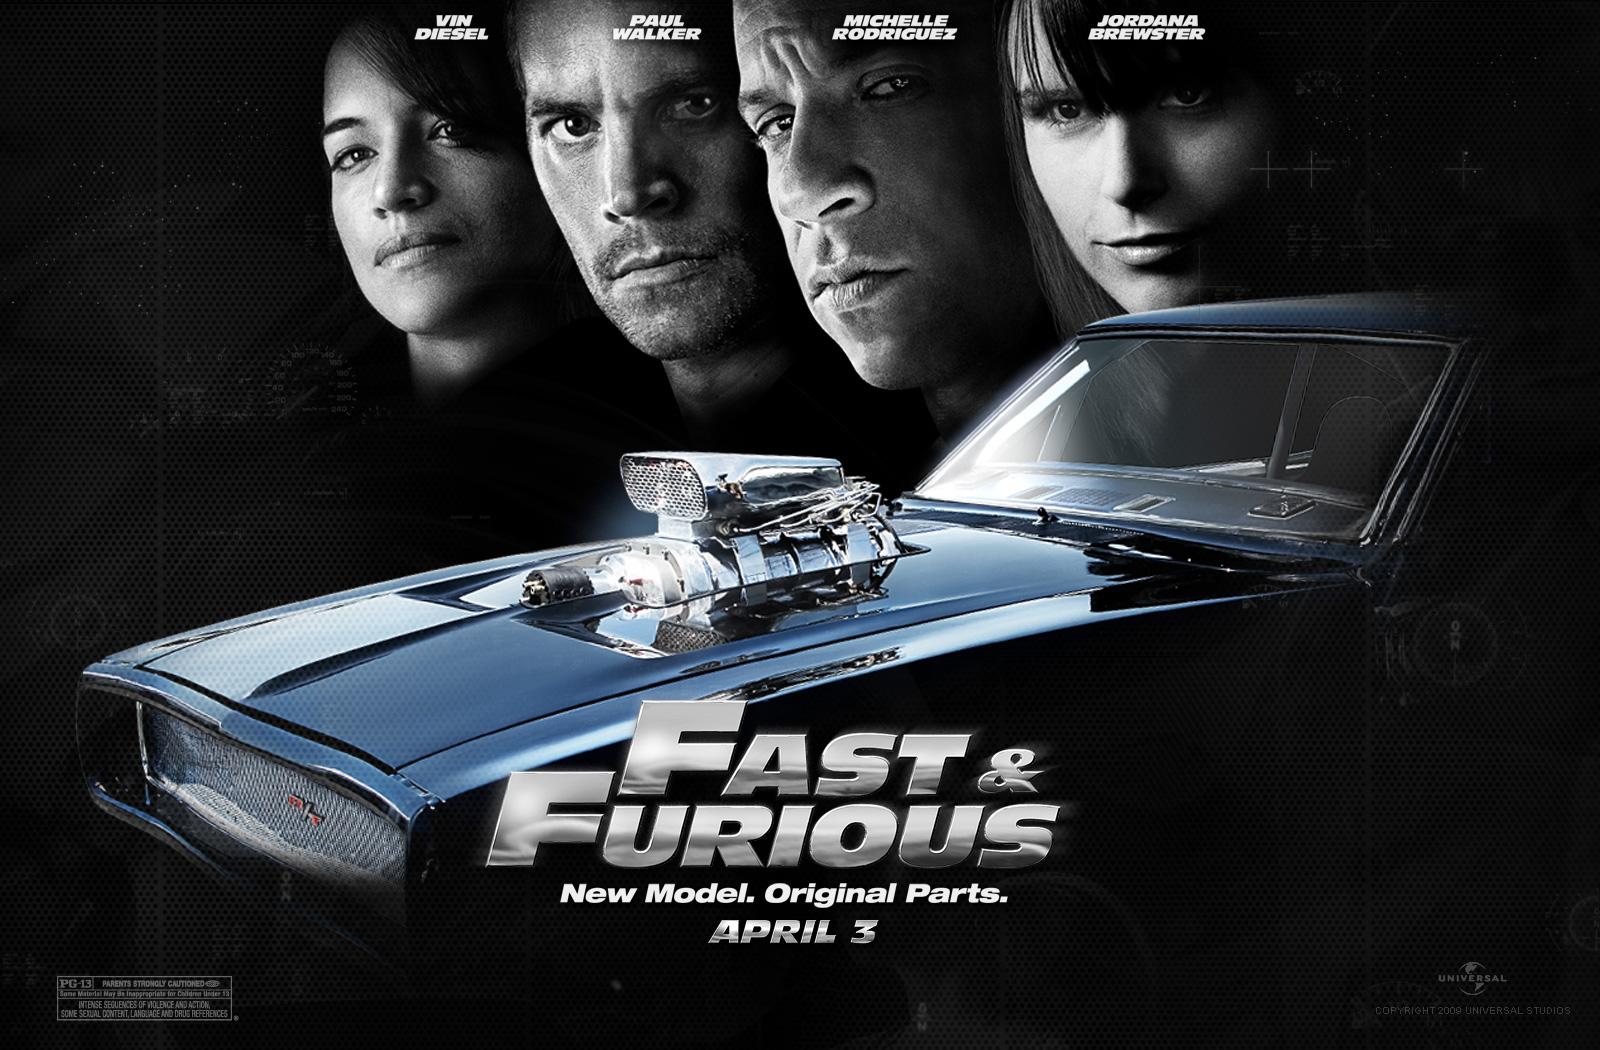 fast and furious cars fast and furious cars wallpapers - Fast And Furious 7 Cars Iphone Wallpapers